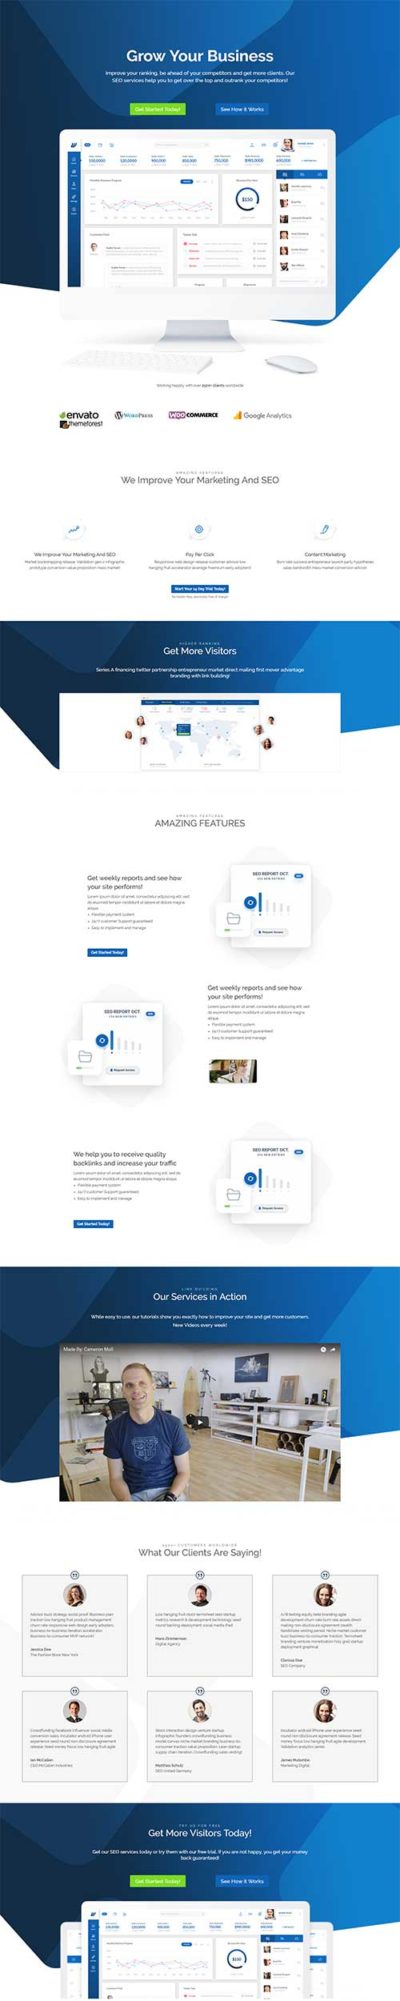 free divi theme landing page layout